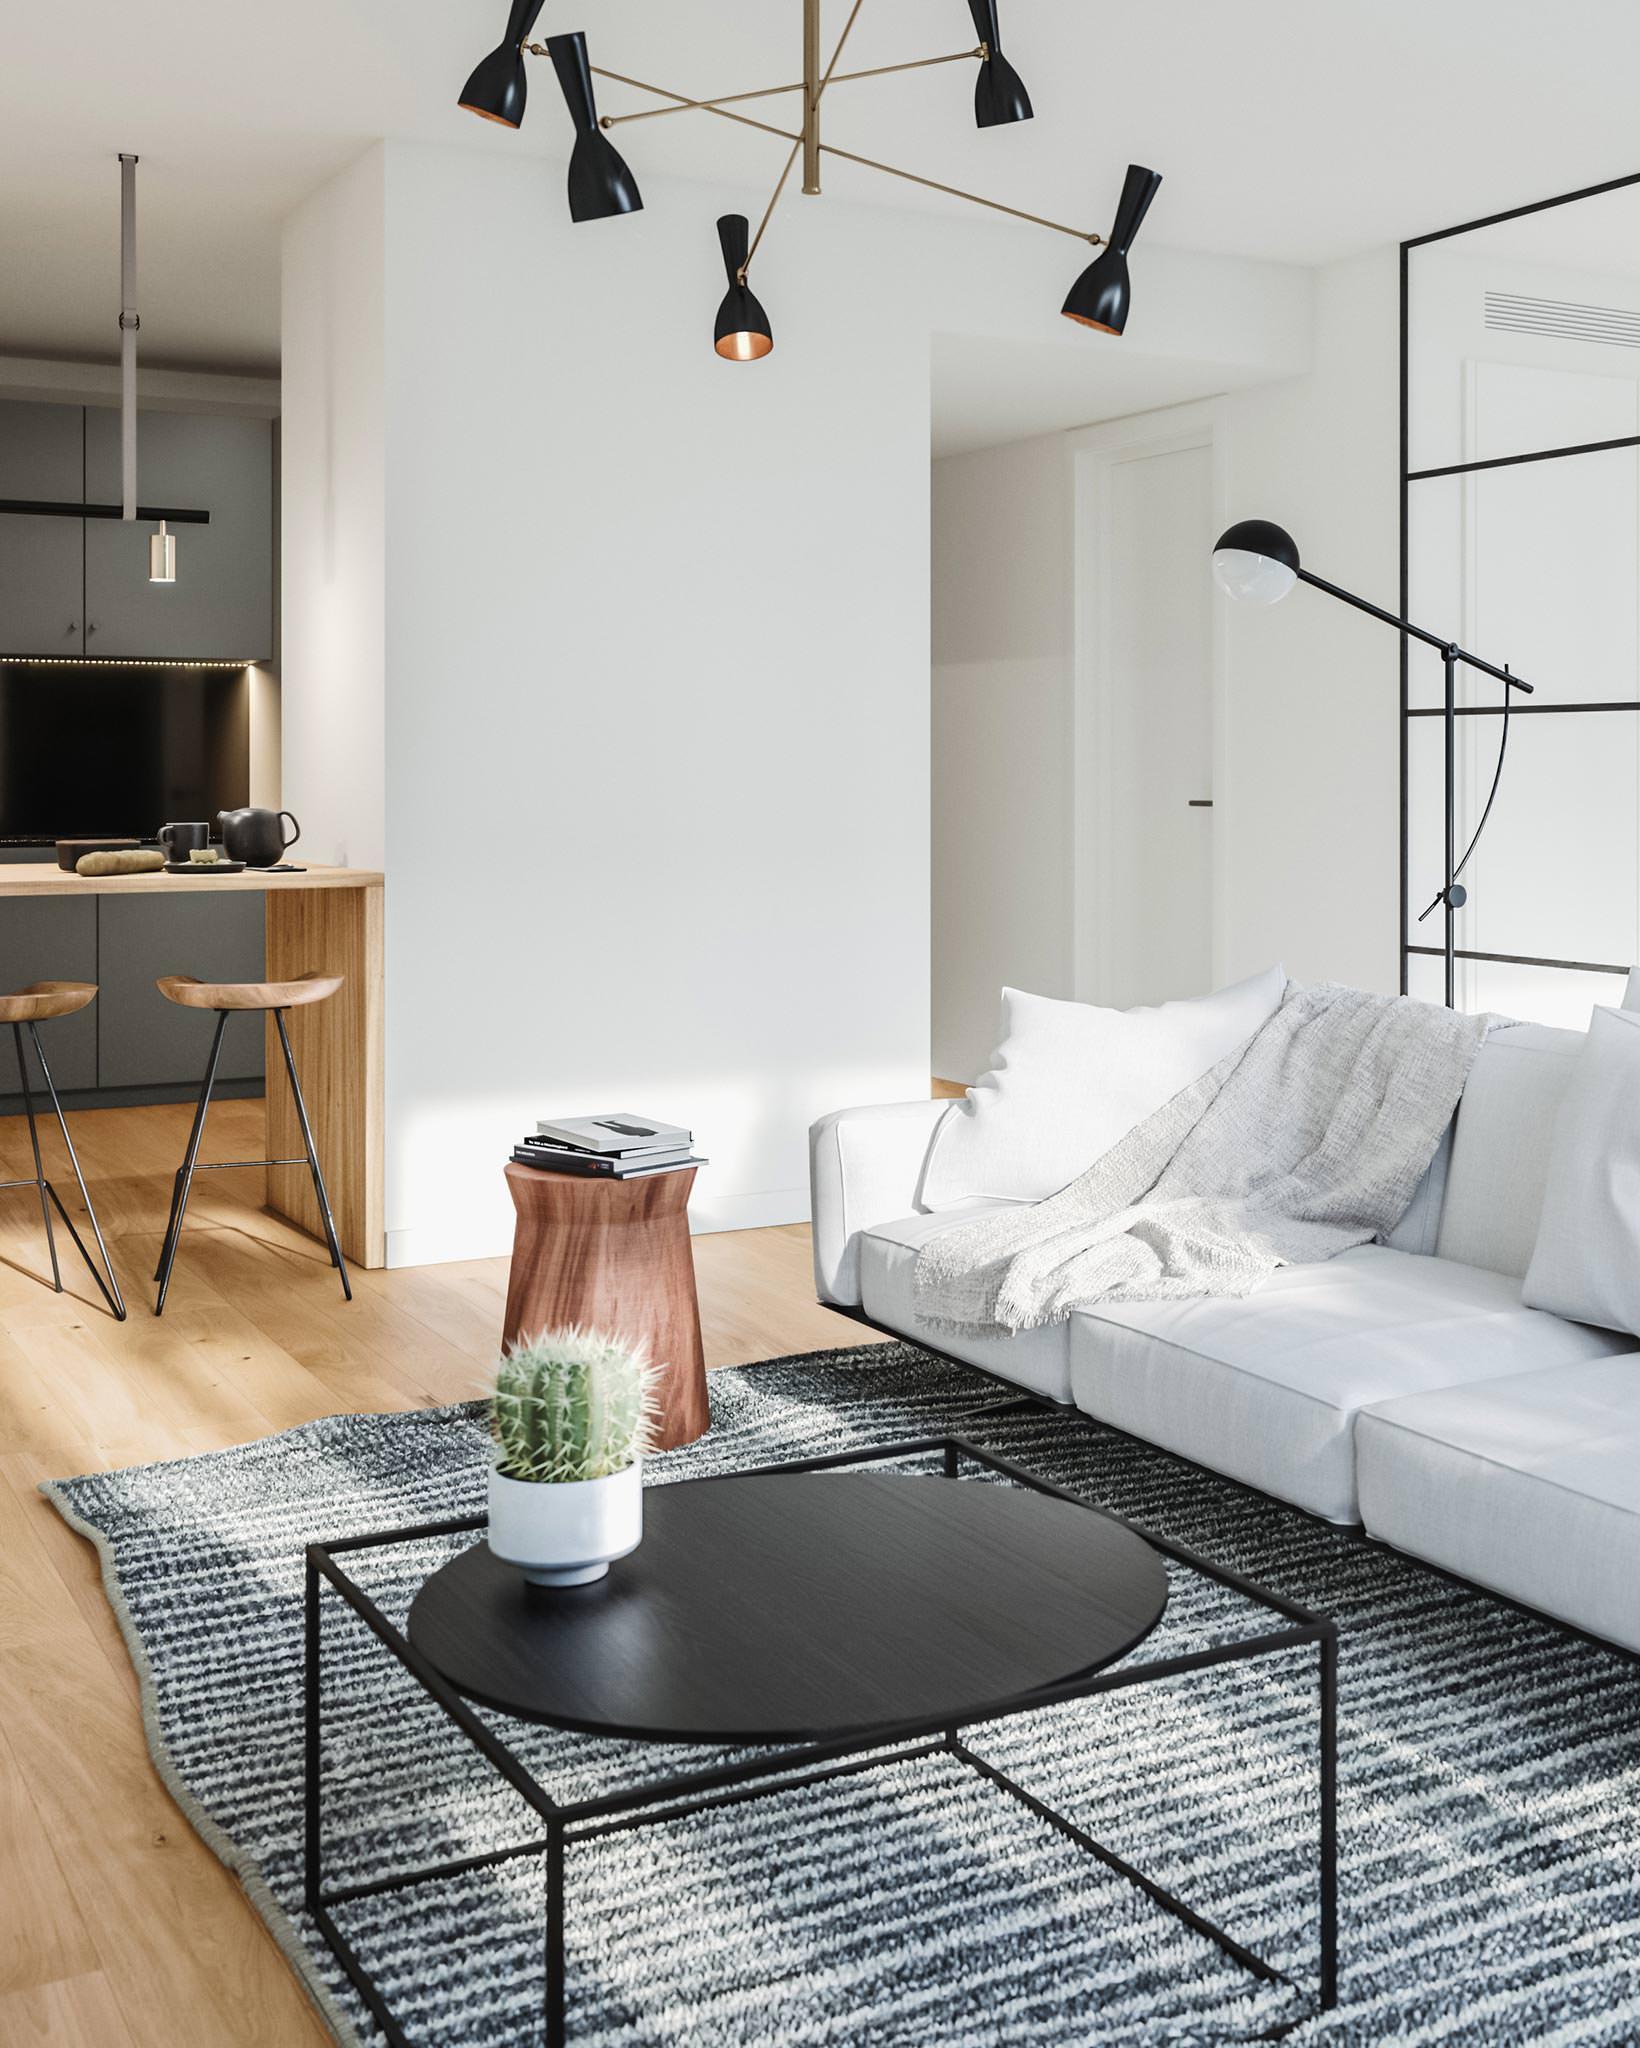 About Lumino Lisbon - Living Room